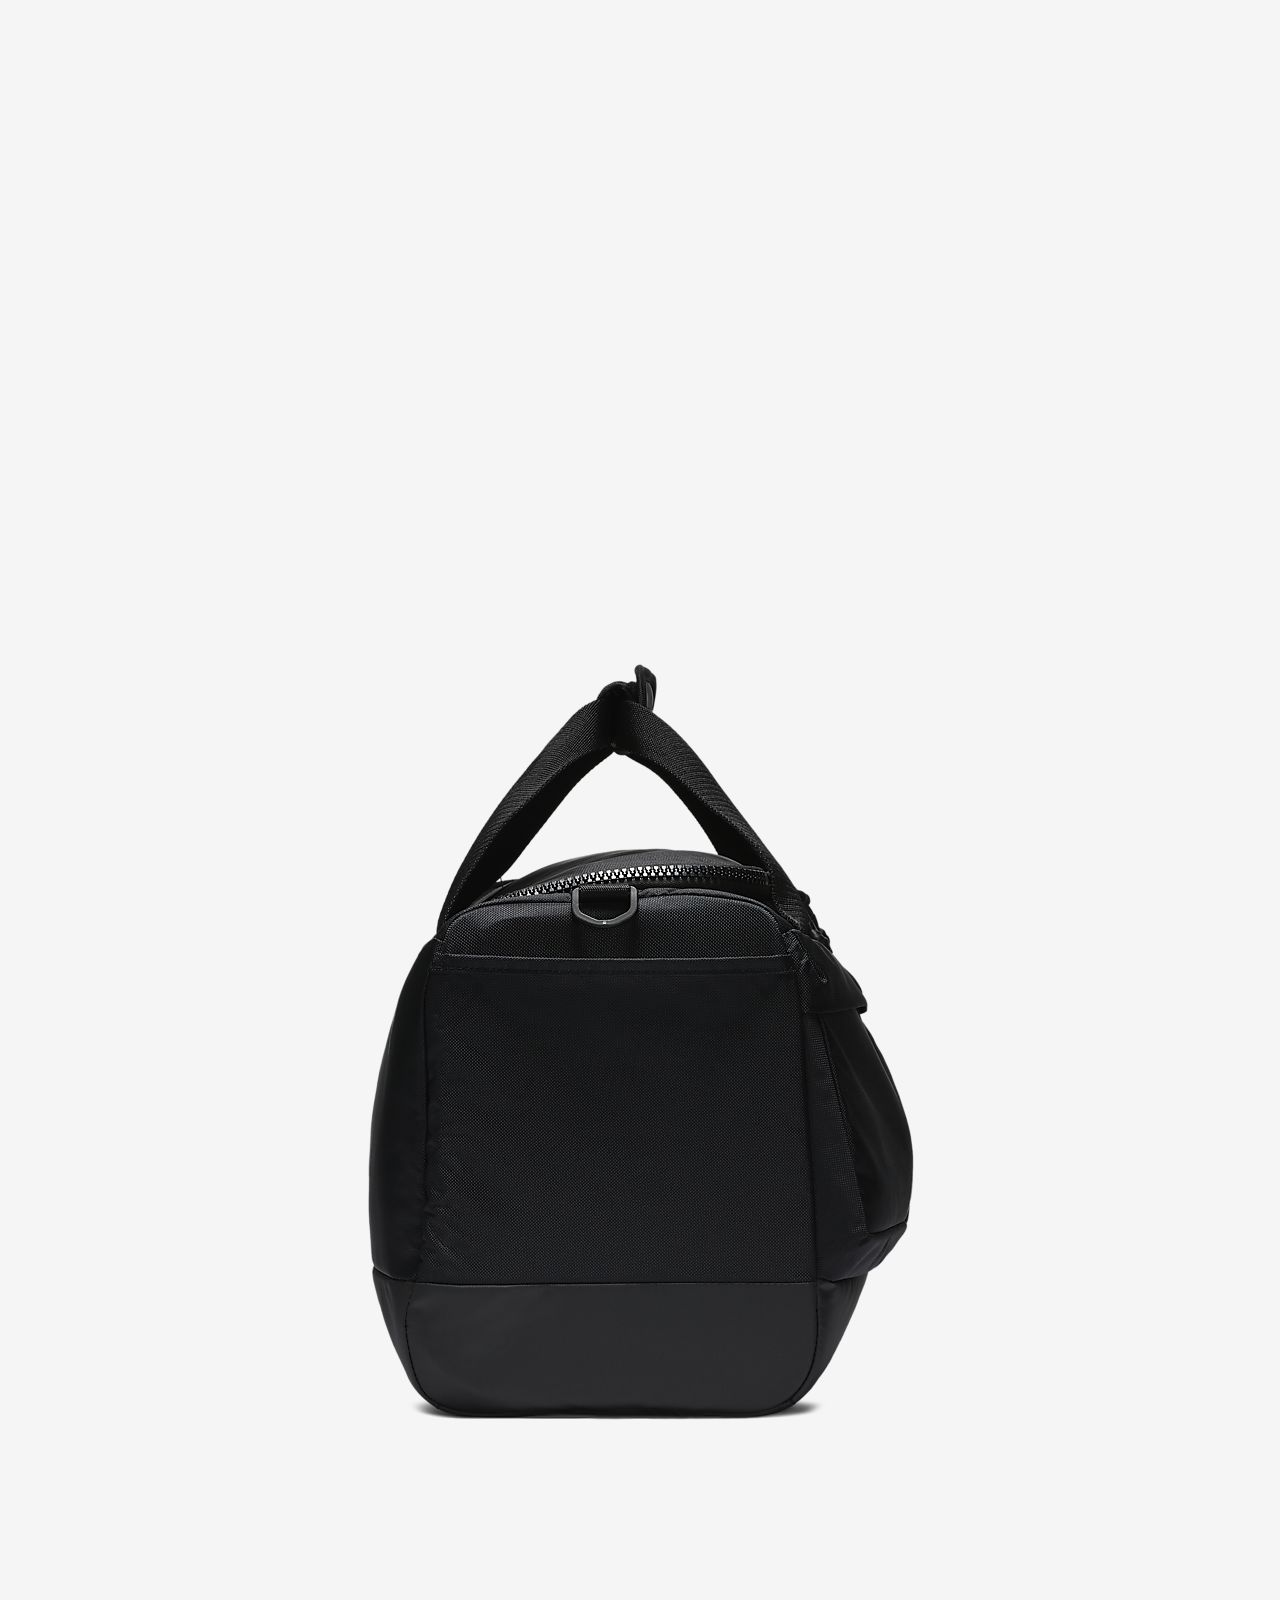 Nike Vapor Power Men s Training Duffel Bag (Small). Nike.com AU 4403aa4e70811